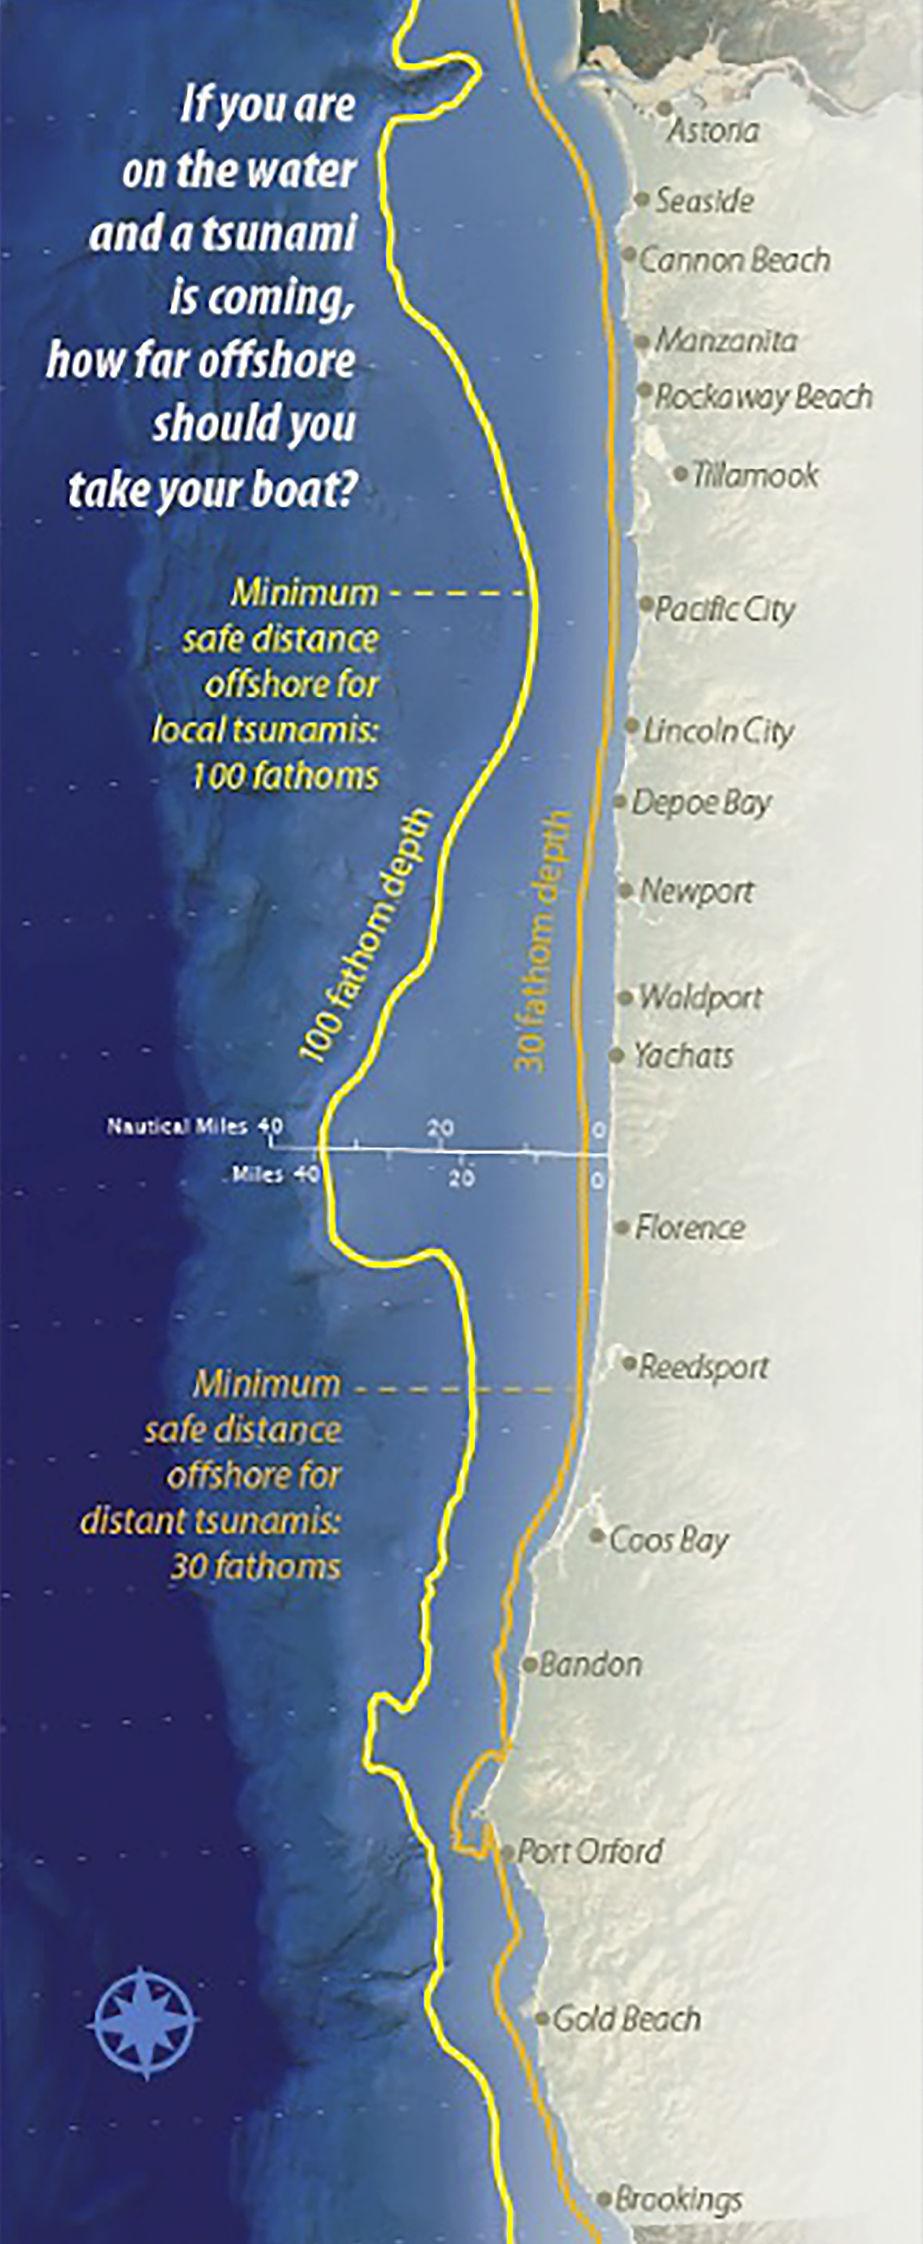 Tsunami map